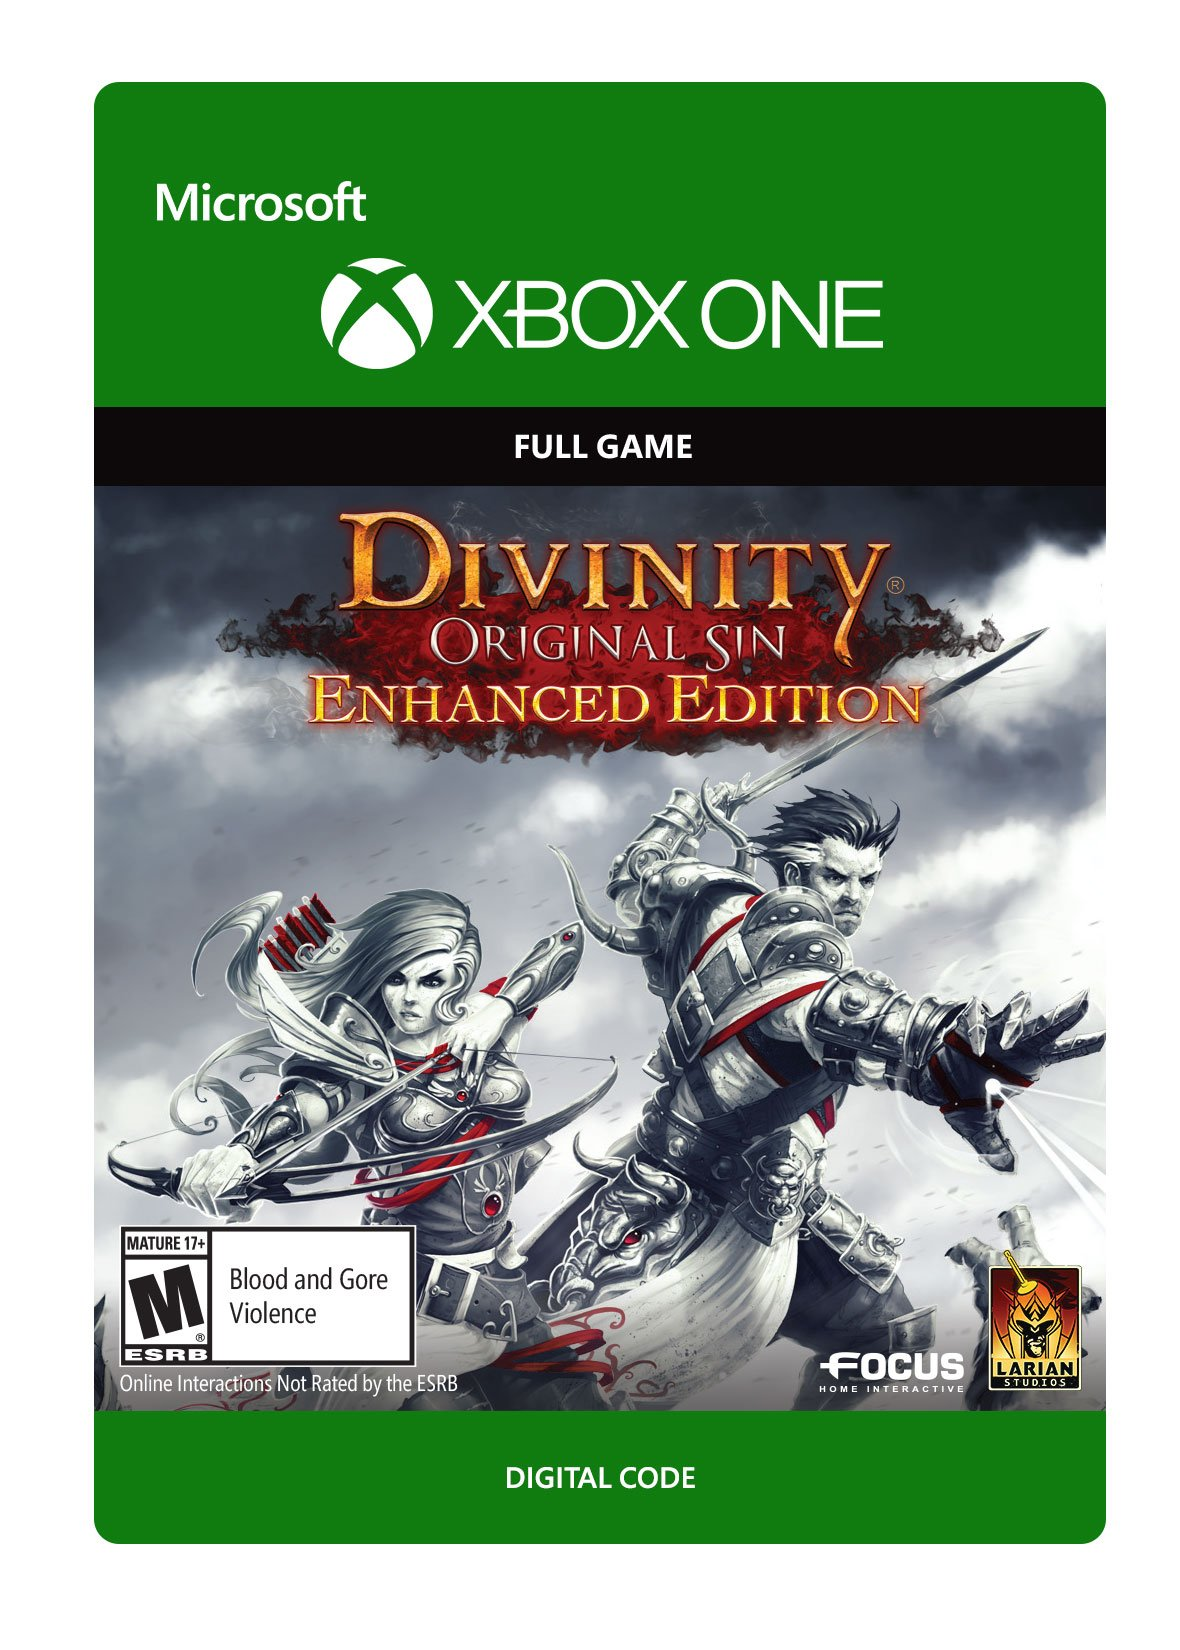 Divinity Original Sin: Enhanced Edition - Xbox One Digital Code